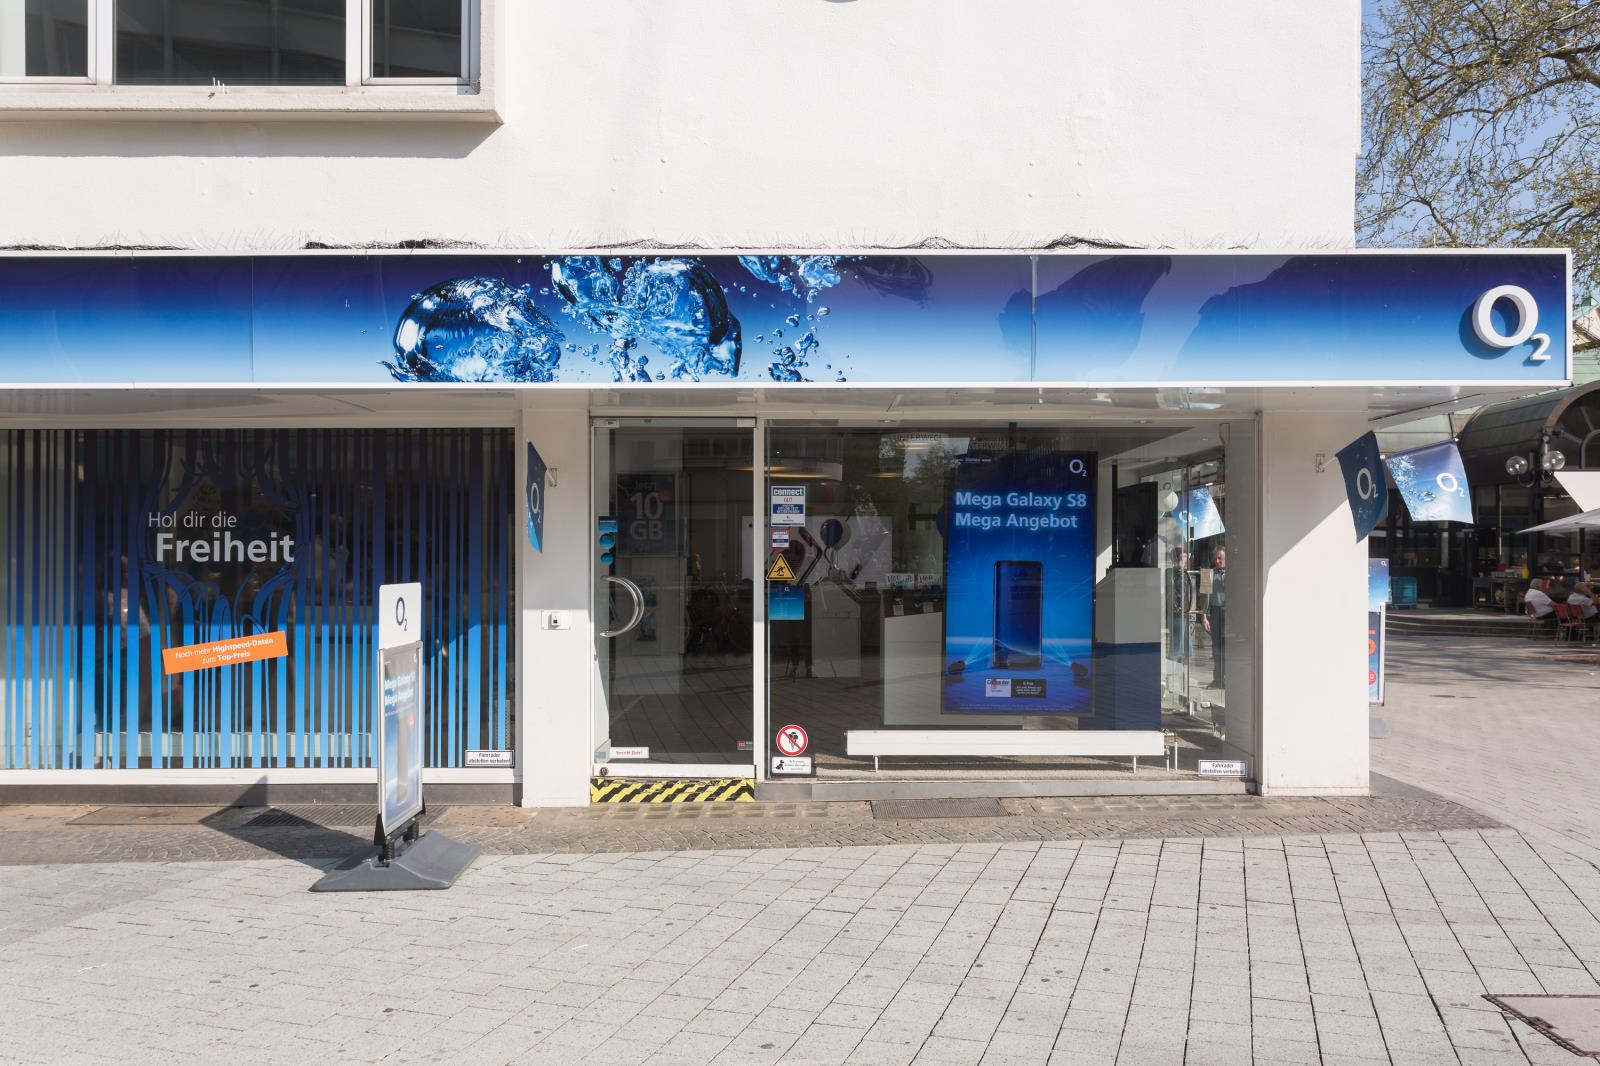 o2 Shop, Bahnhofstr. 1 in Hannover